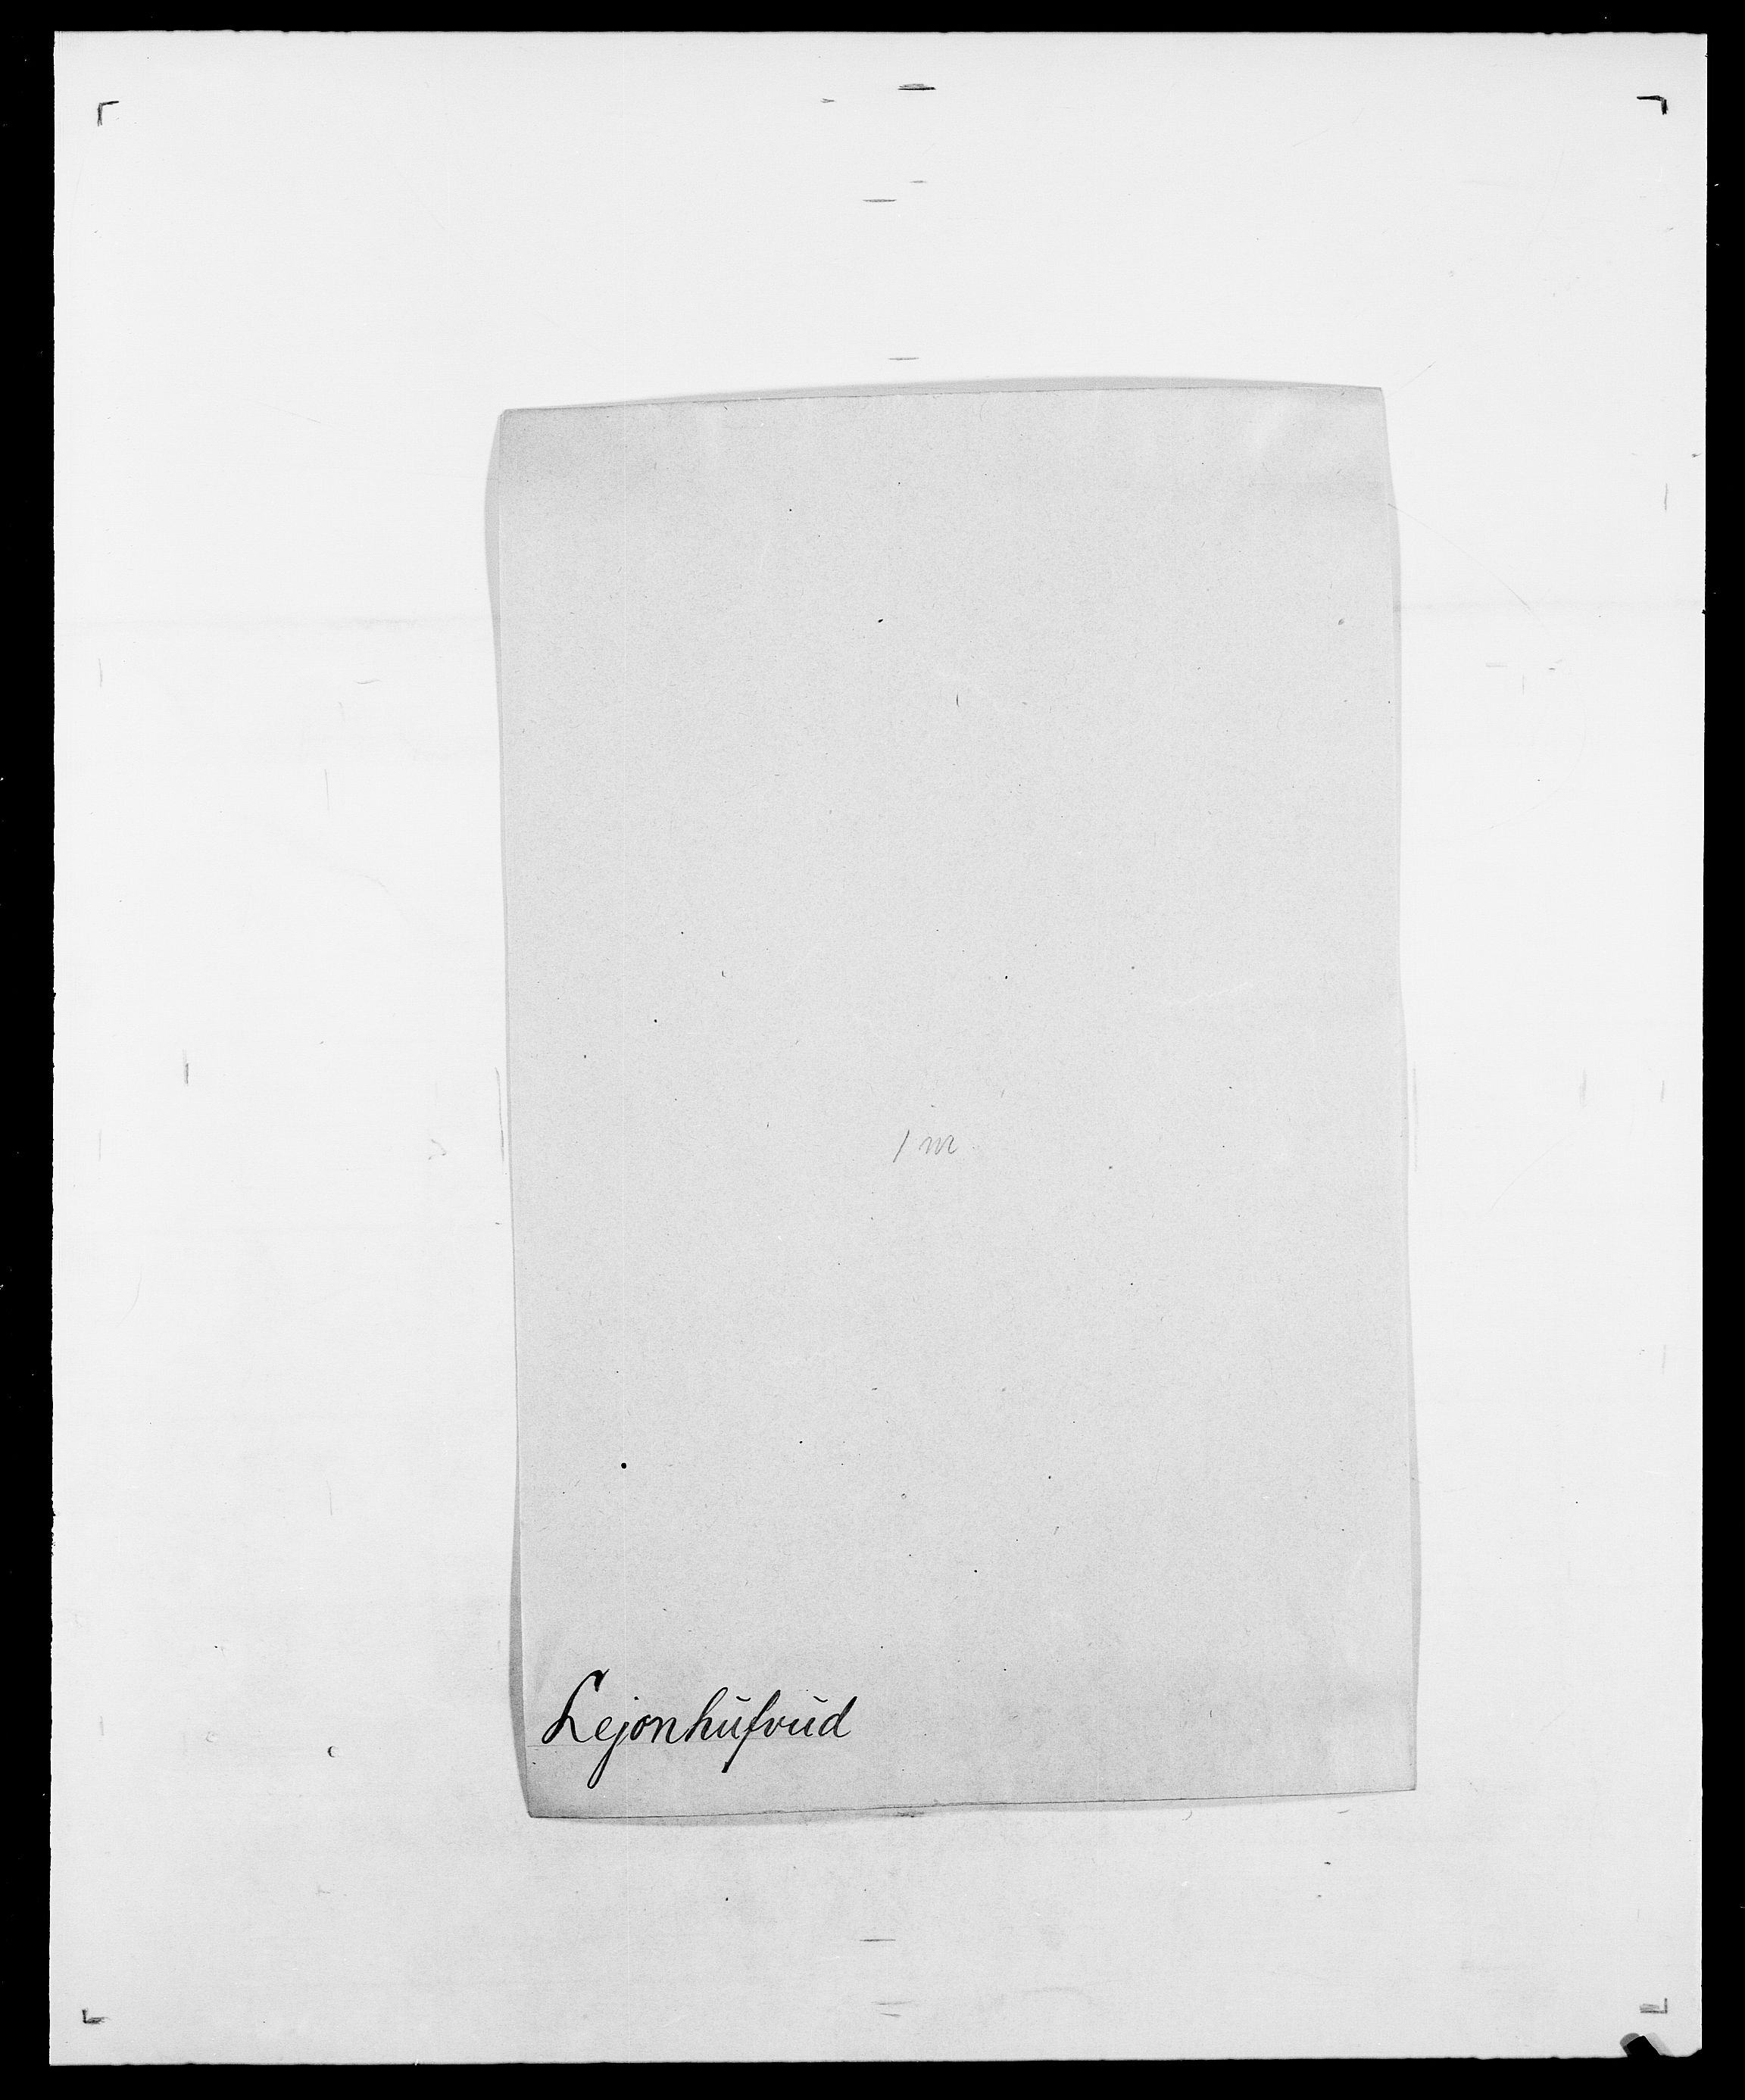 SAO, Delgobe, Charles Antoine - samling, D/Da/L0023: Lau - Lirvyn, s. 151